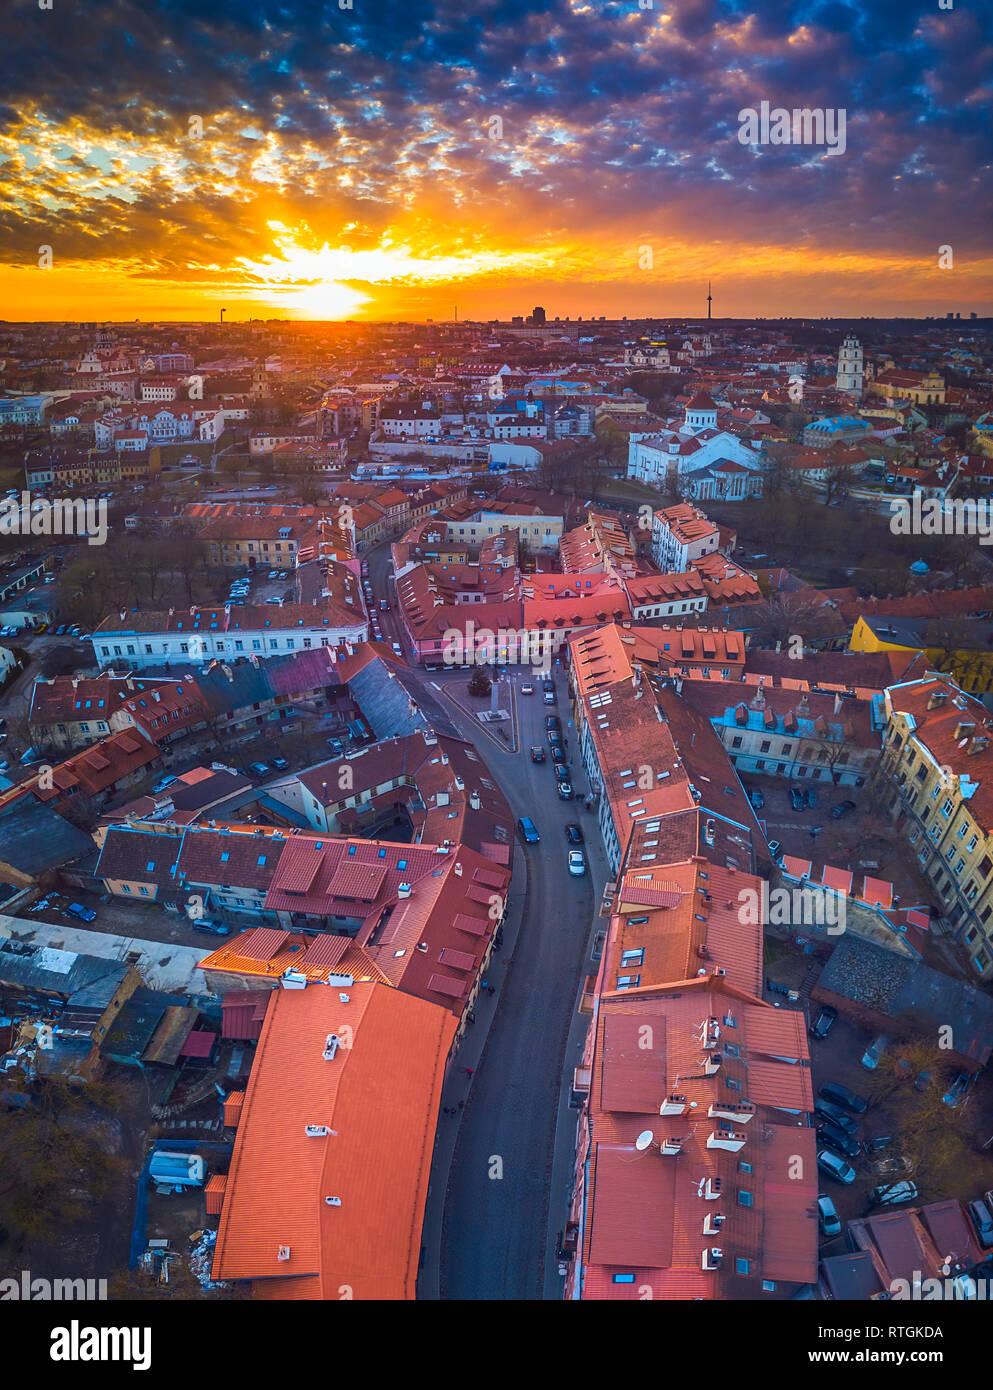 Vilna, Lituania - vista aérea de la ciudad vieja de Vilnius Foto de stock